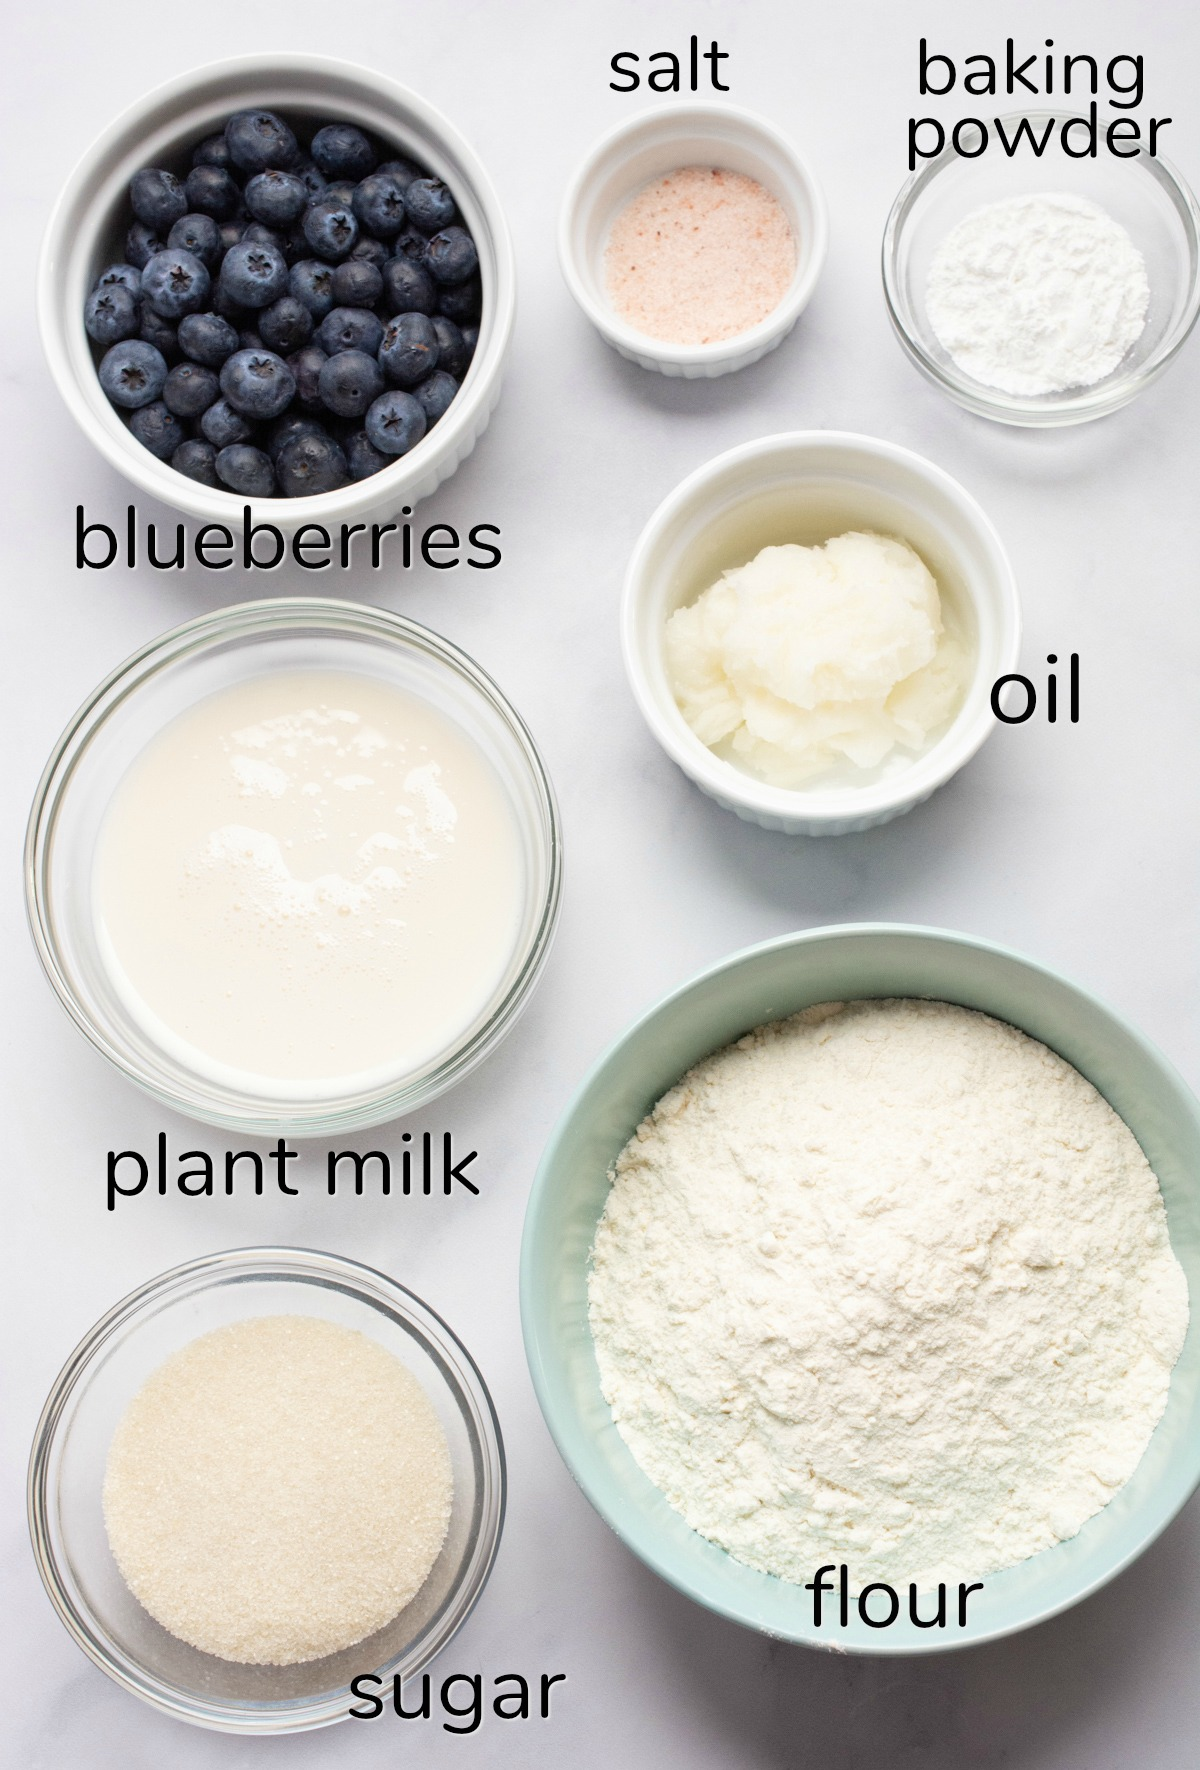 Labeled ingredients to make vegan blueberry scones.